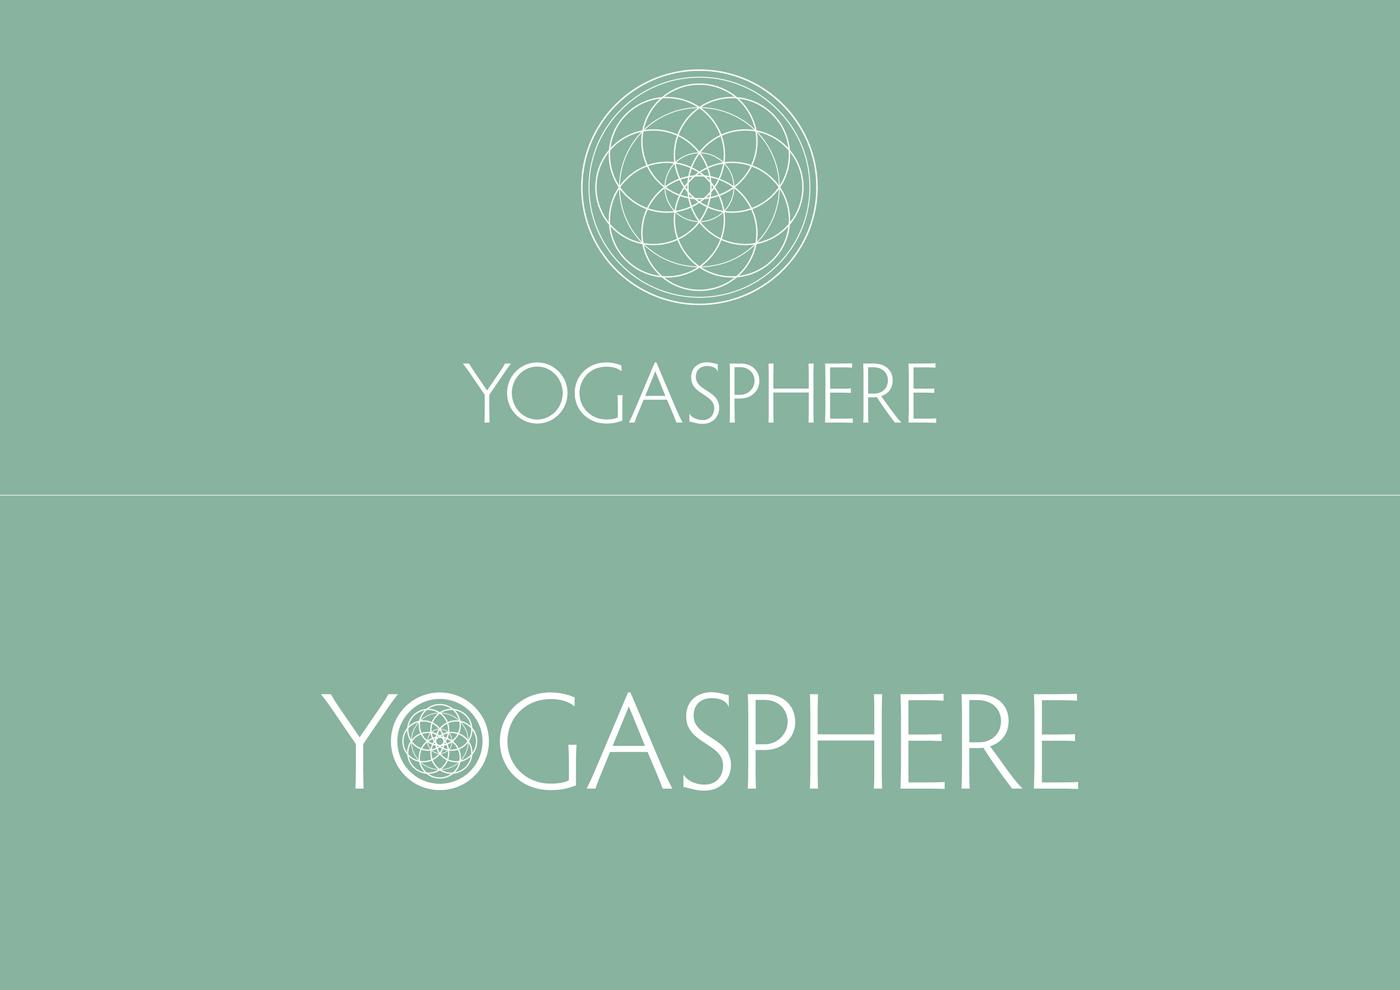 Yogasphere - White logo on teal background